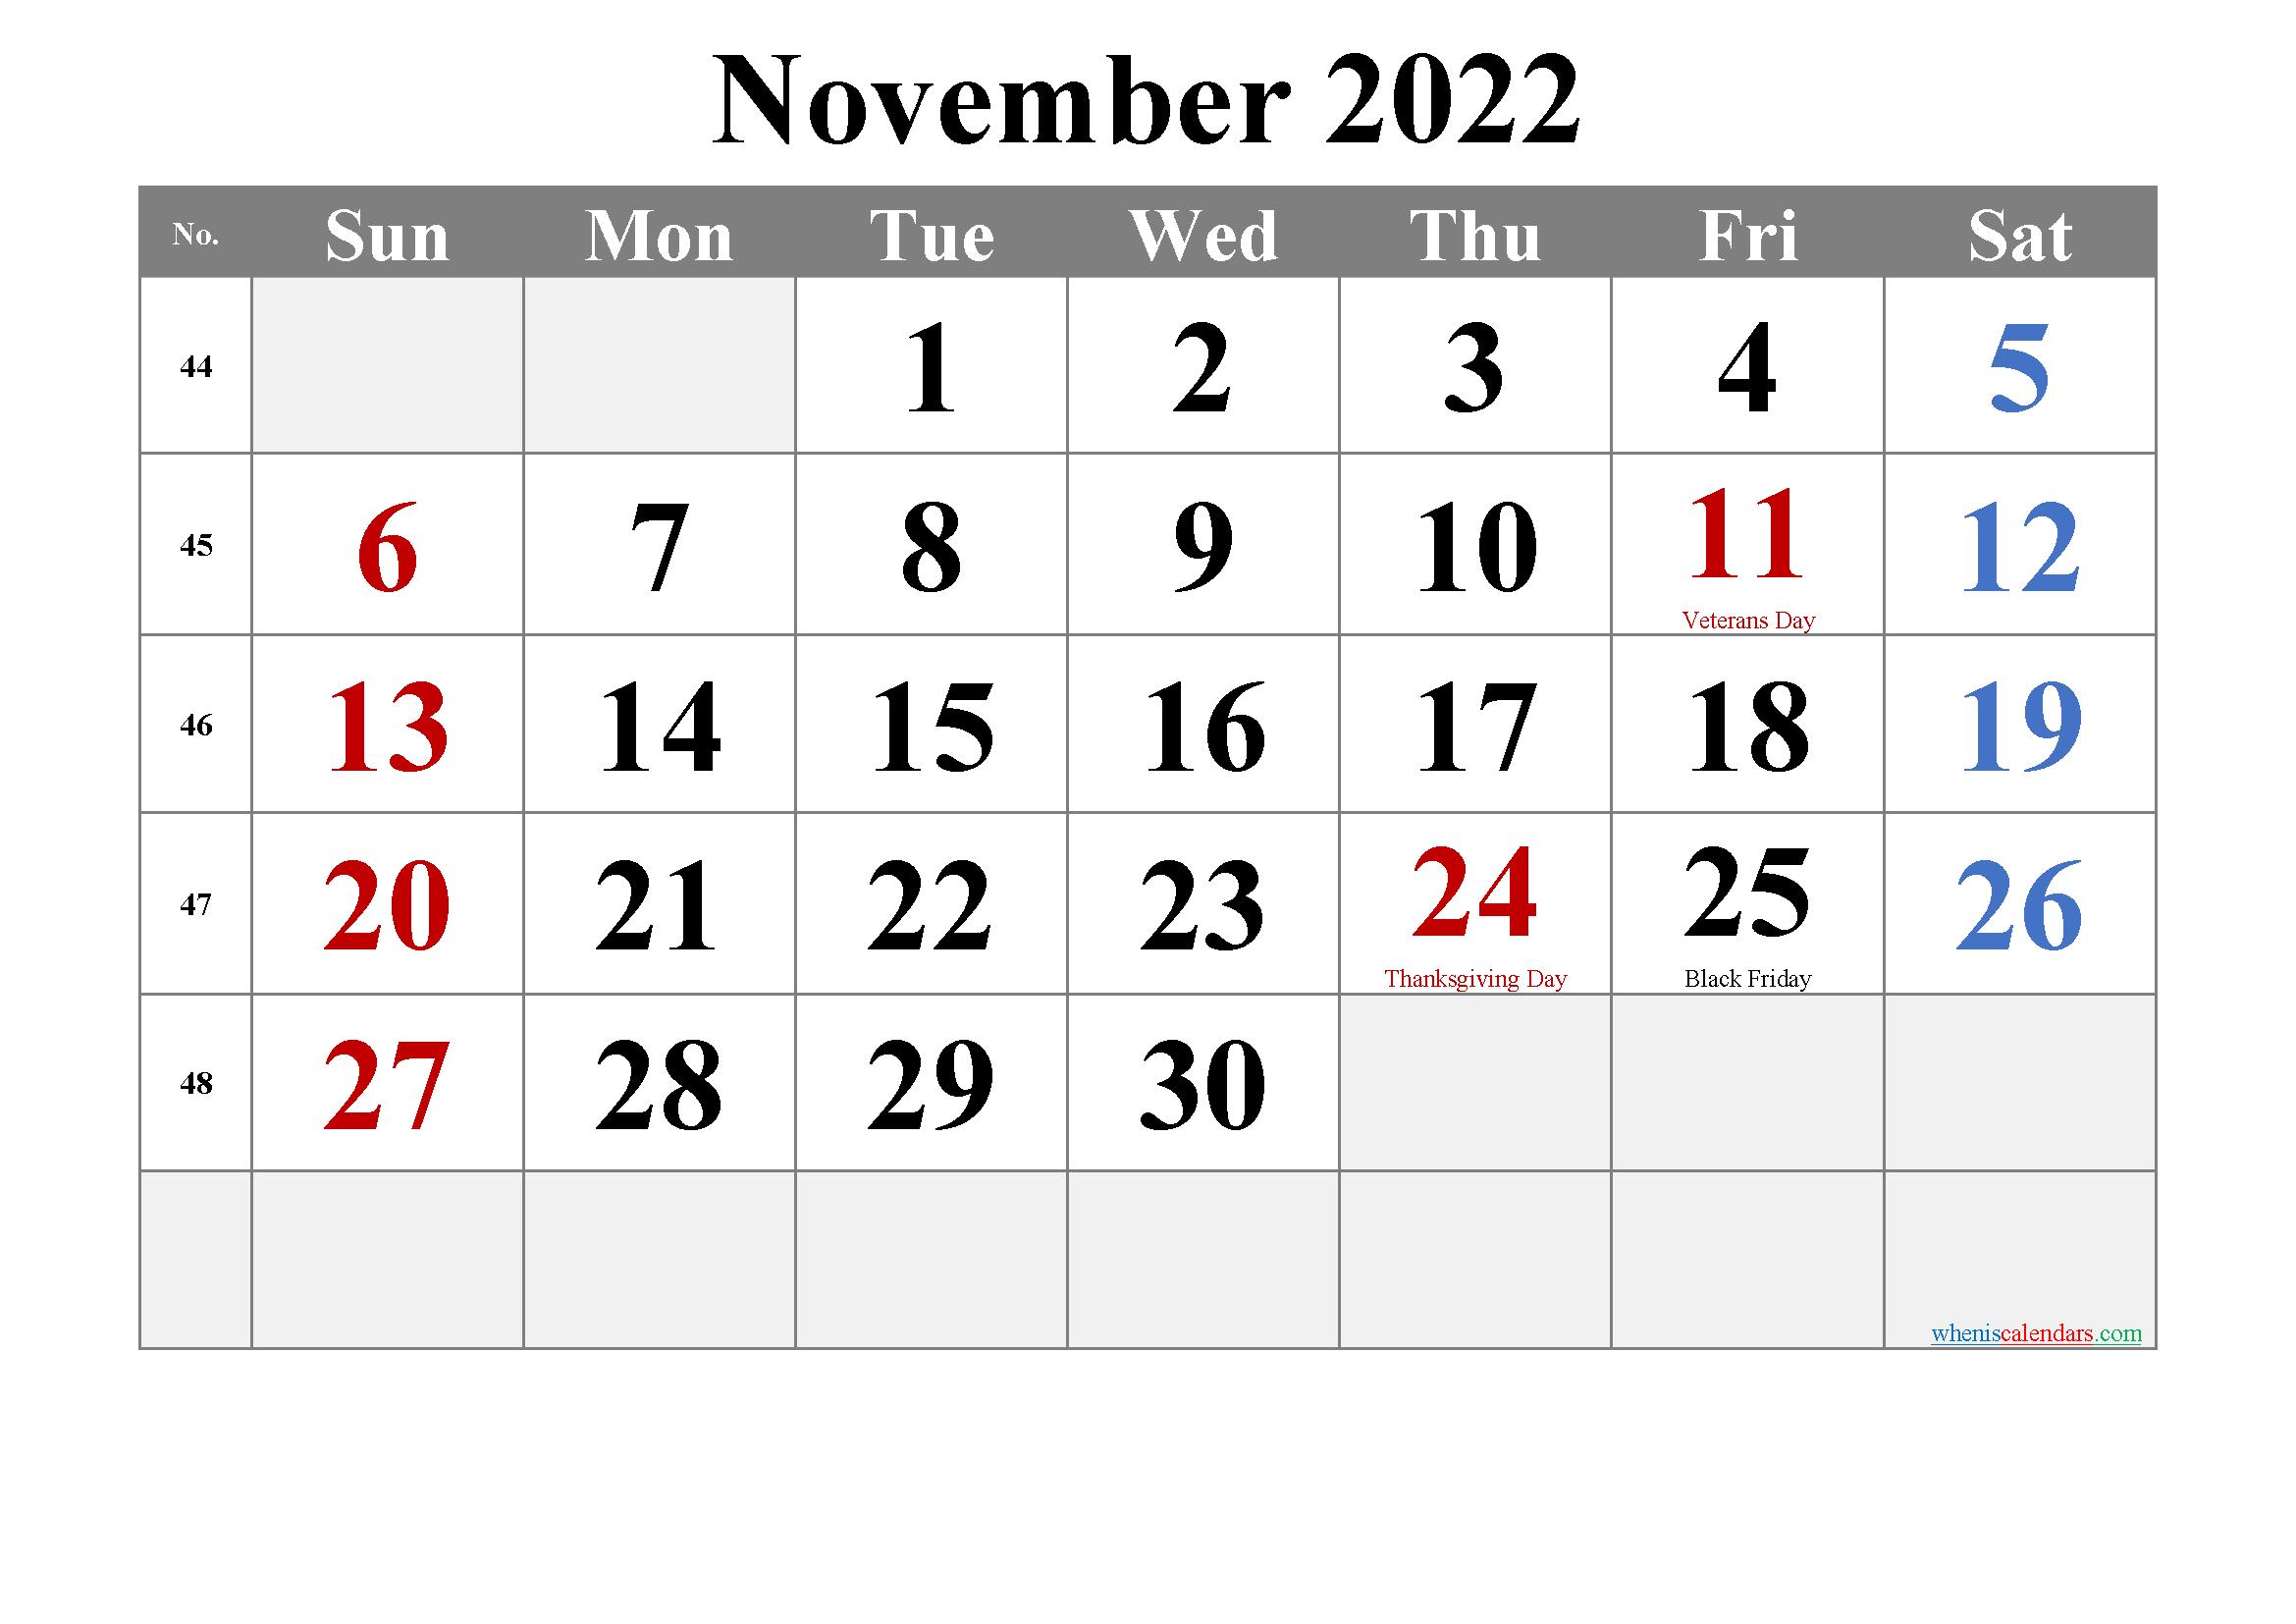 Free Printable November 2022 Calendar With Holidays for November 2022 Calendar Planner Printable